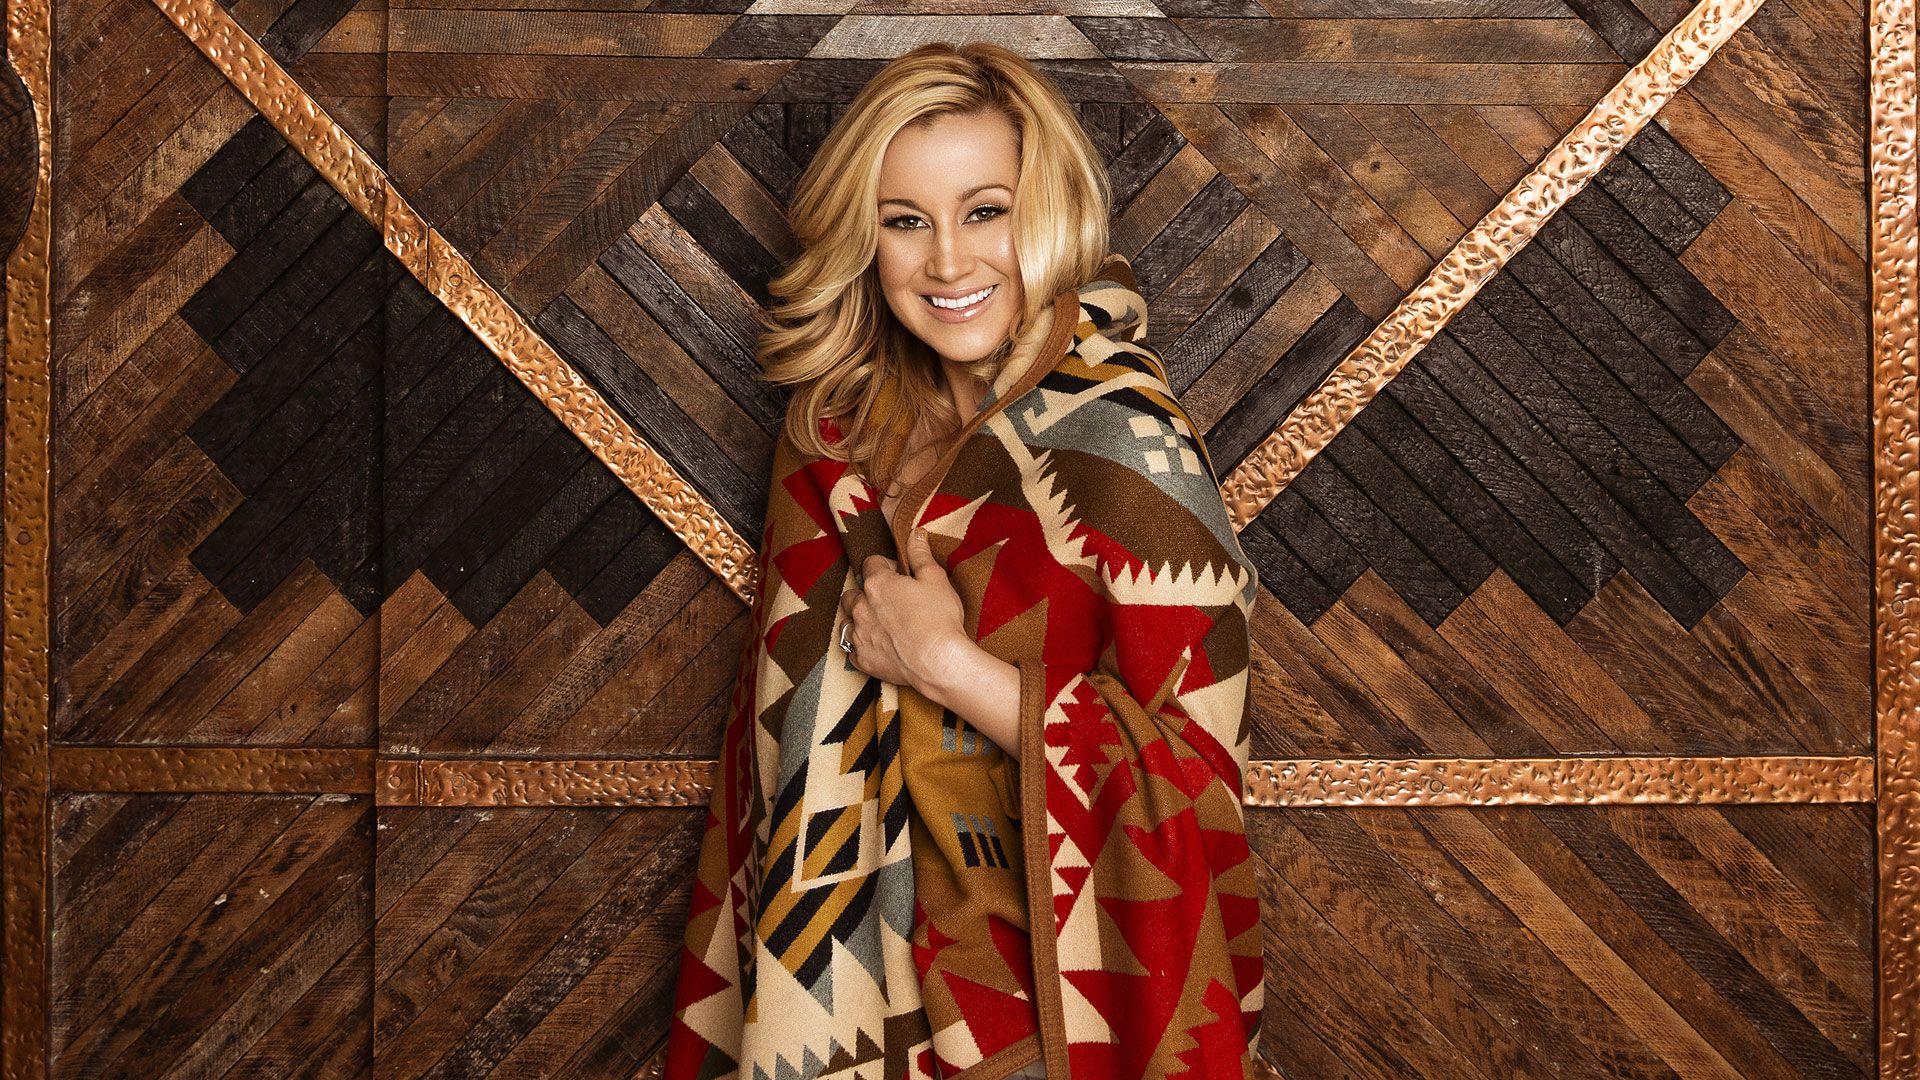 I love kellie pickler season 3 episodes tv series cmt m4hsunfo